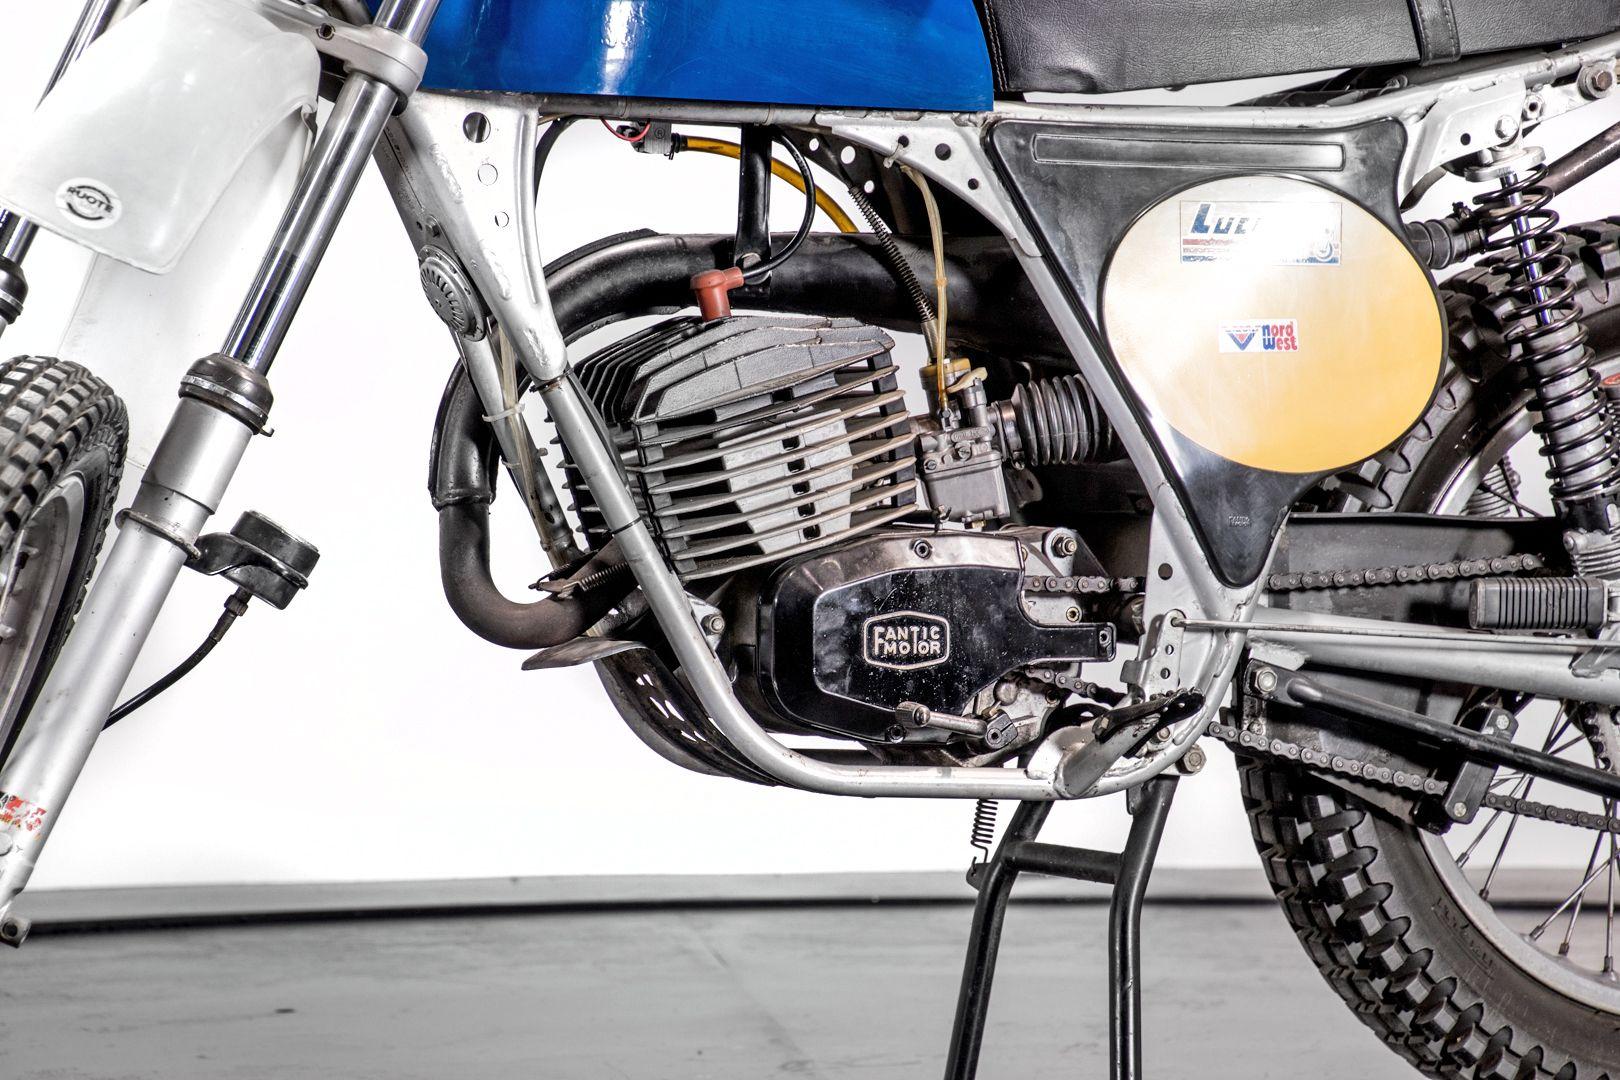 1980 Fantic Motor 125 74643